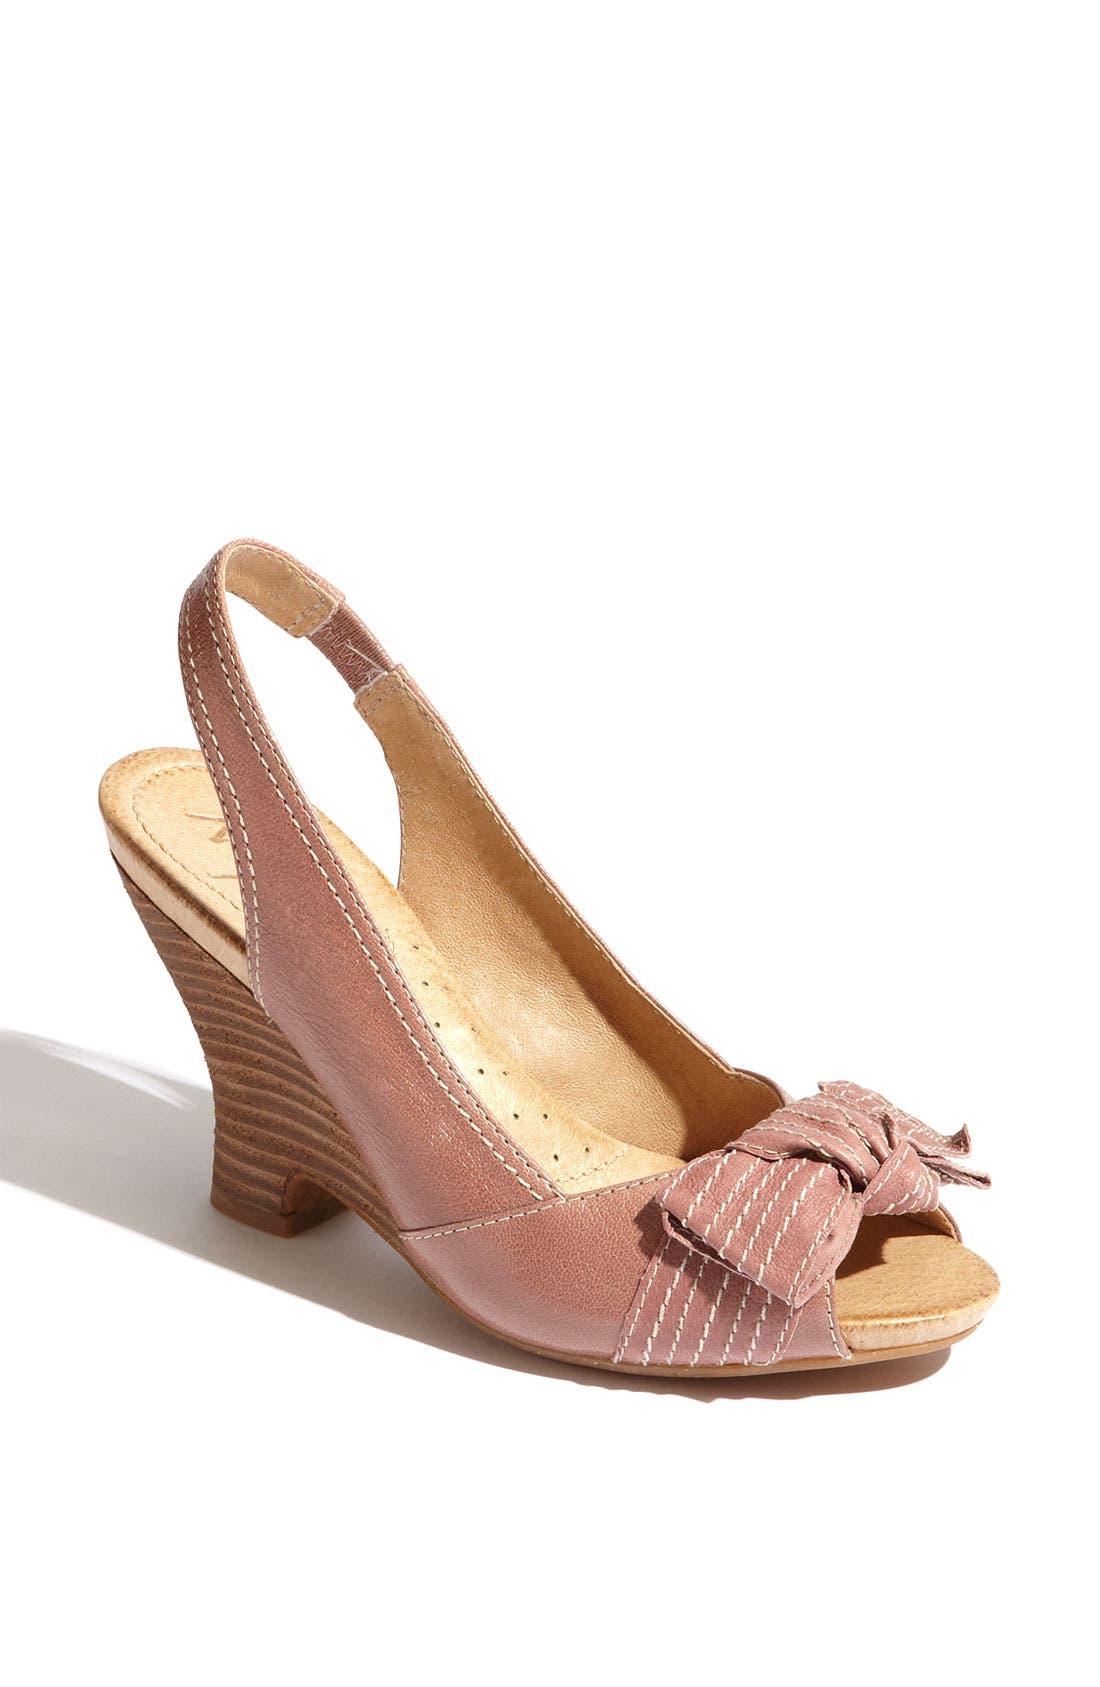 Main Image - Naya 'Giada' Sandal